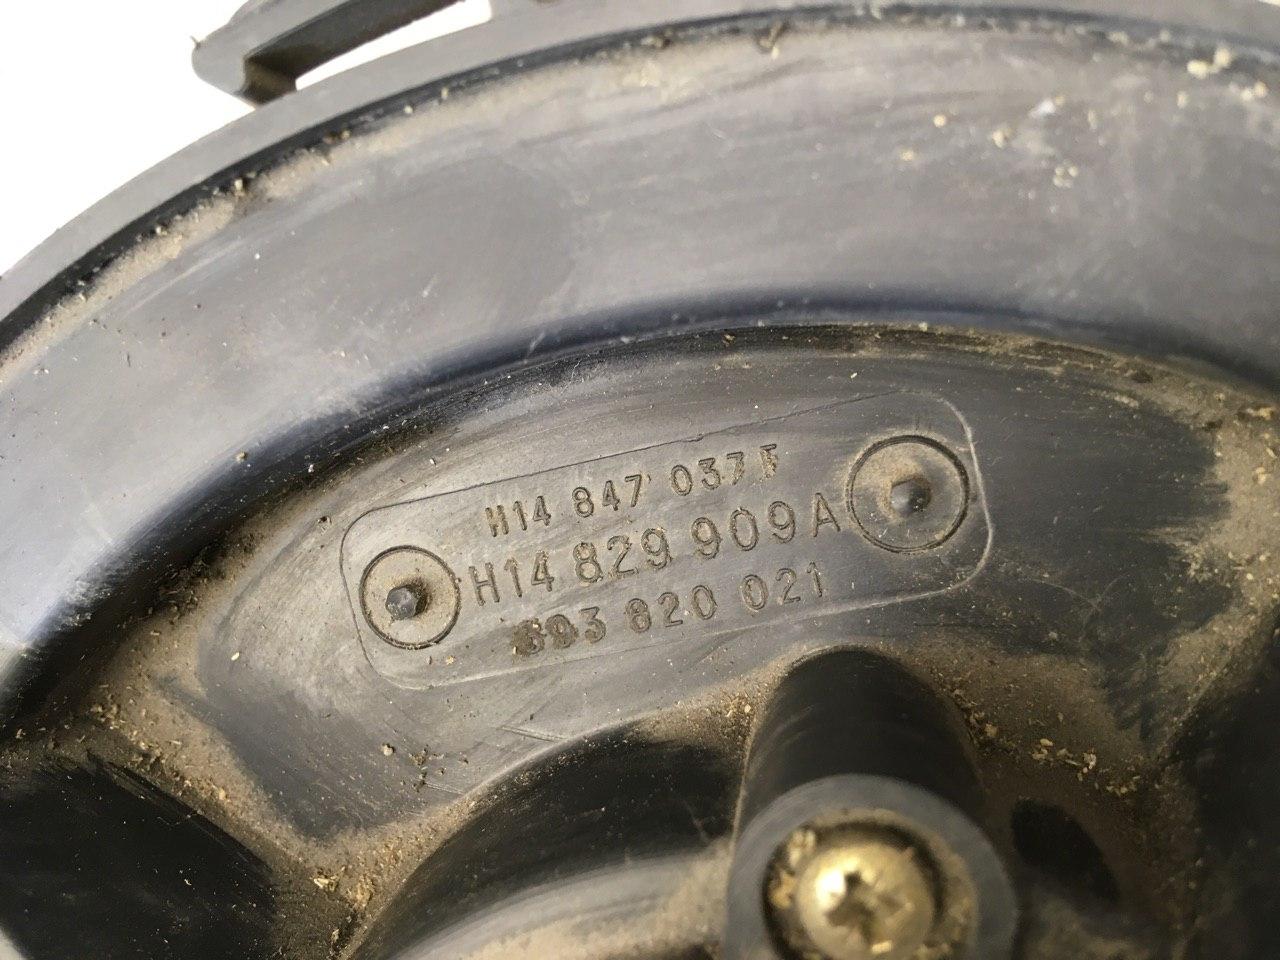 Моторчик отопителя 893820021